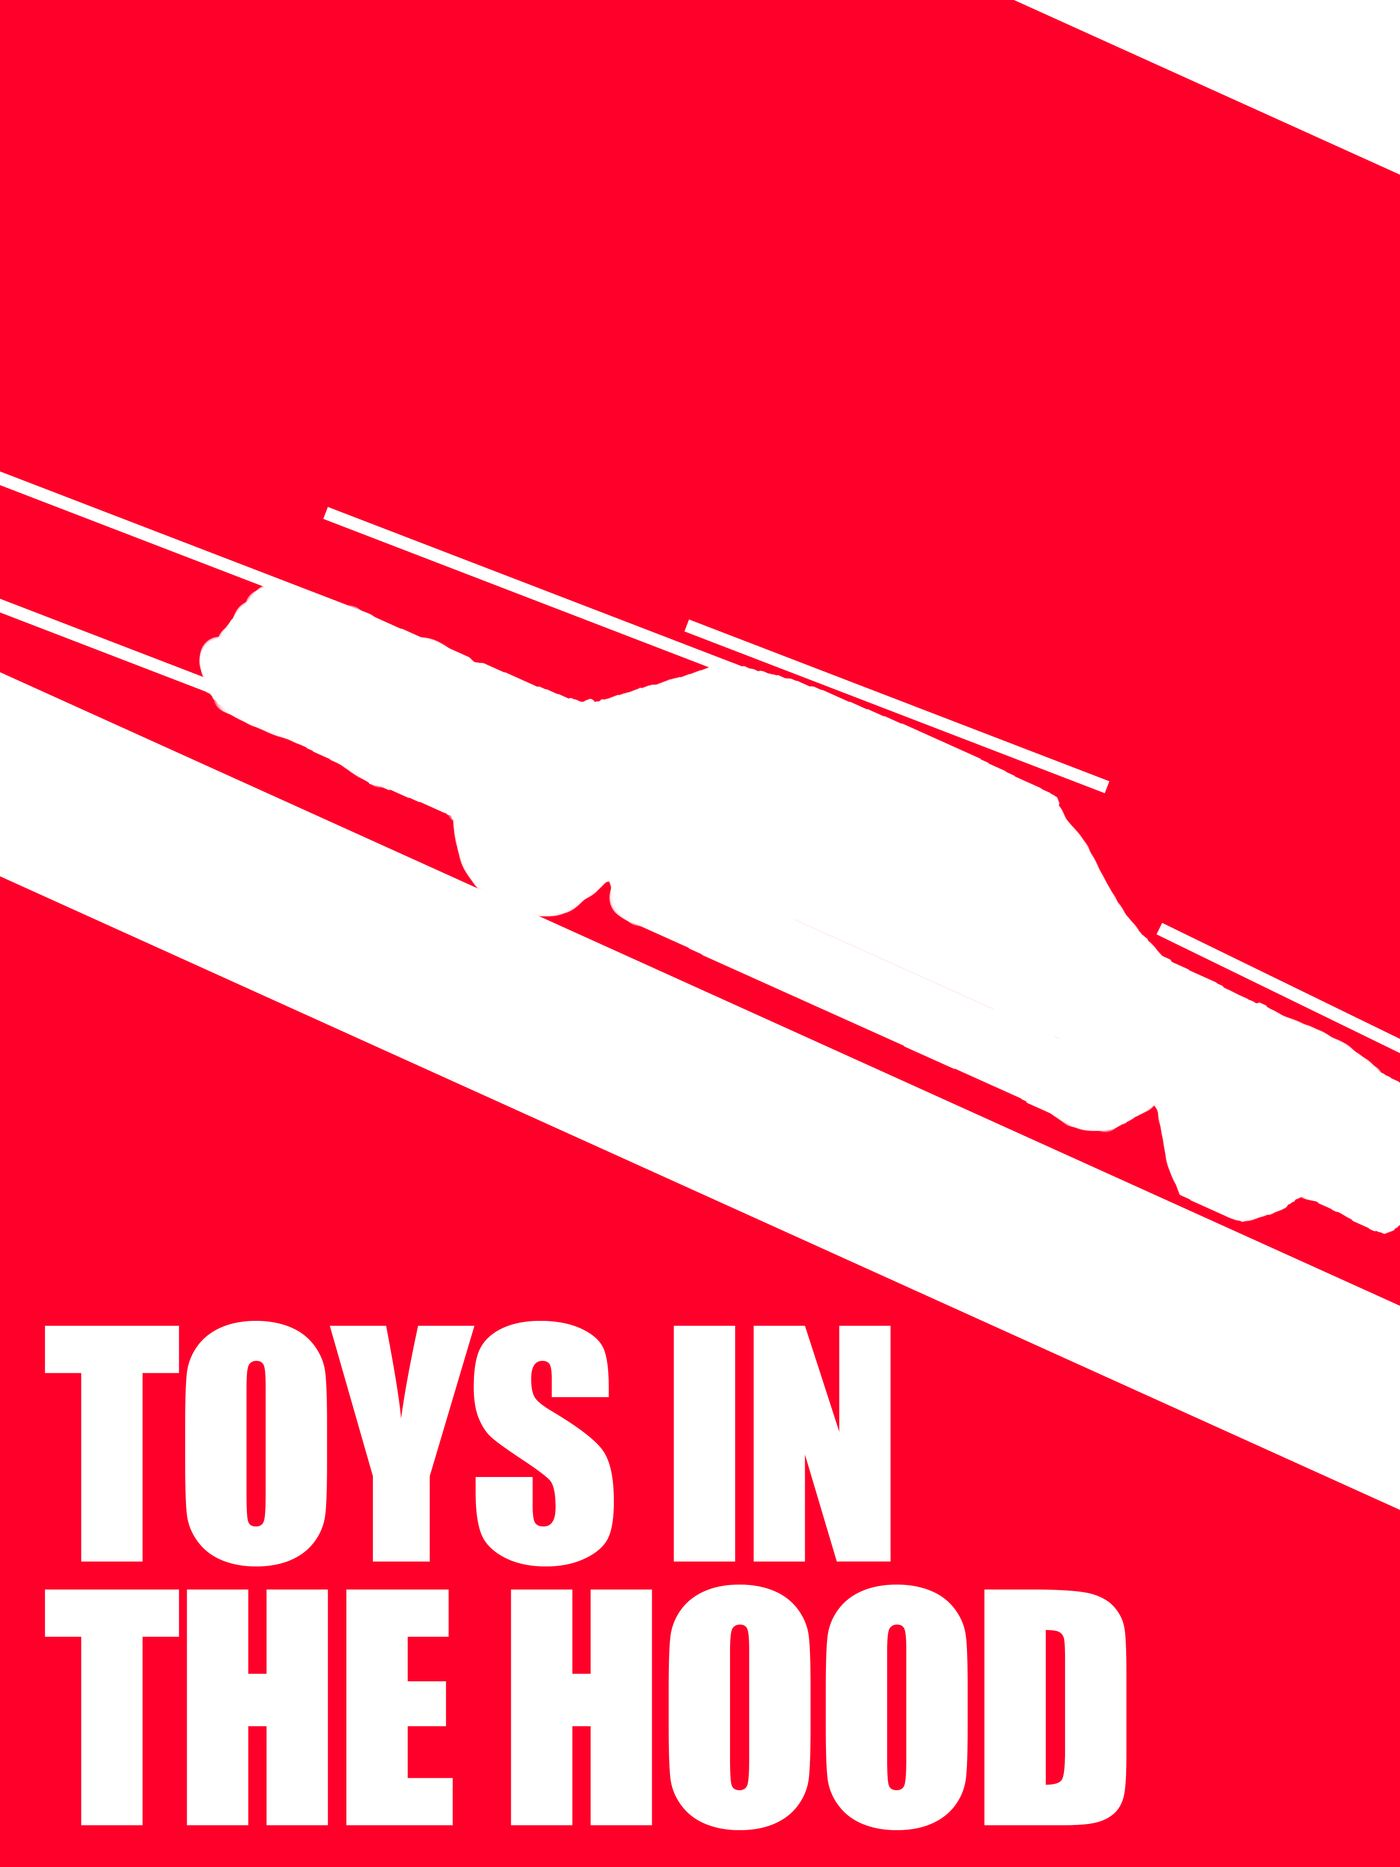 Toys%20 In%20 The%20 Hood Jamesleigh111